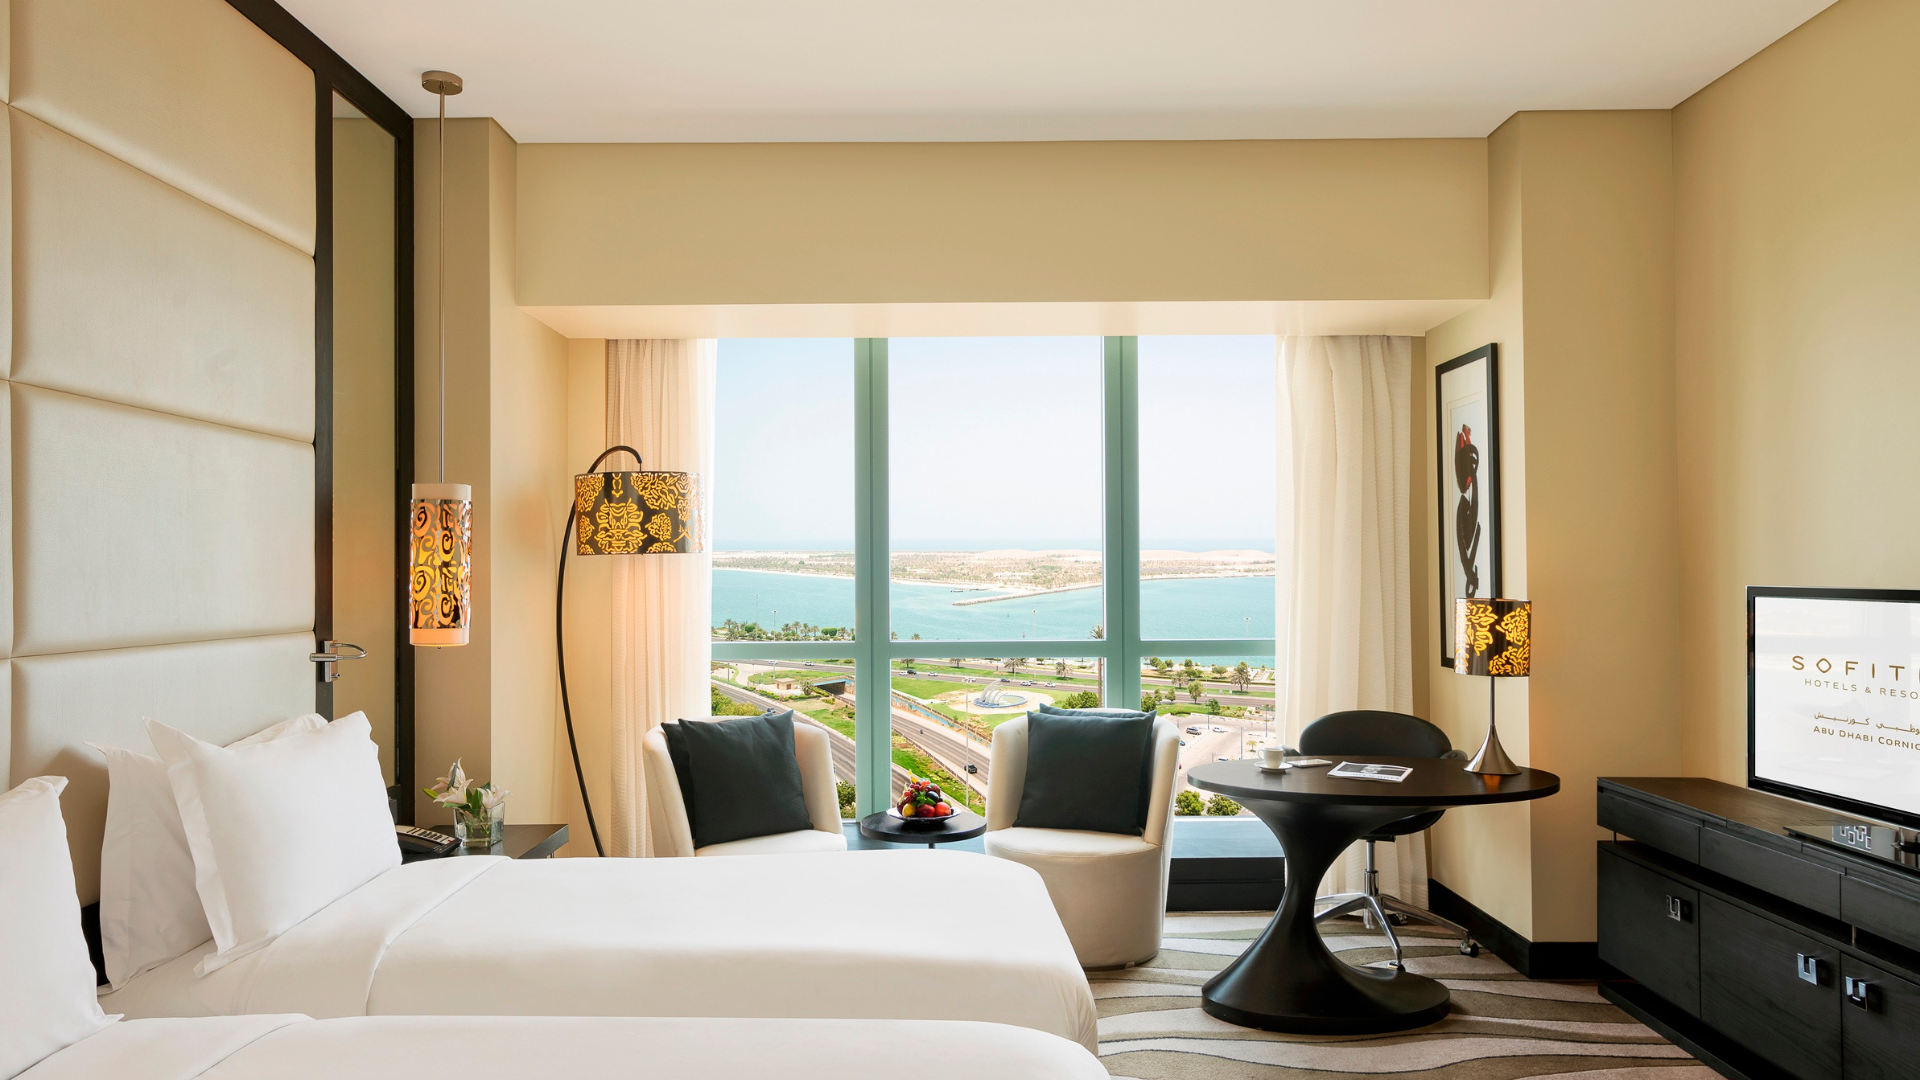 luxury-room-club-sofitel-club-millesime-access-2-single-beds-sea-view